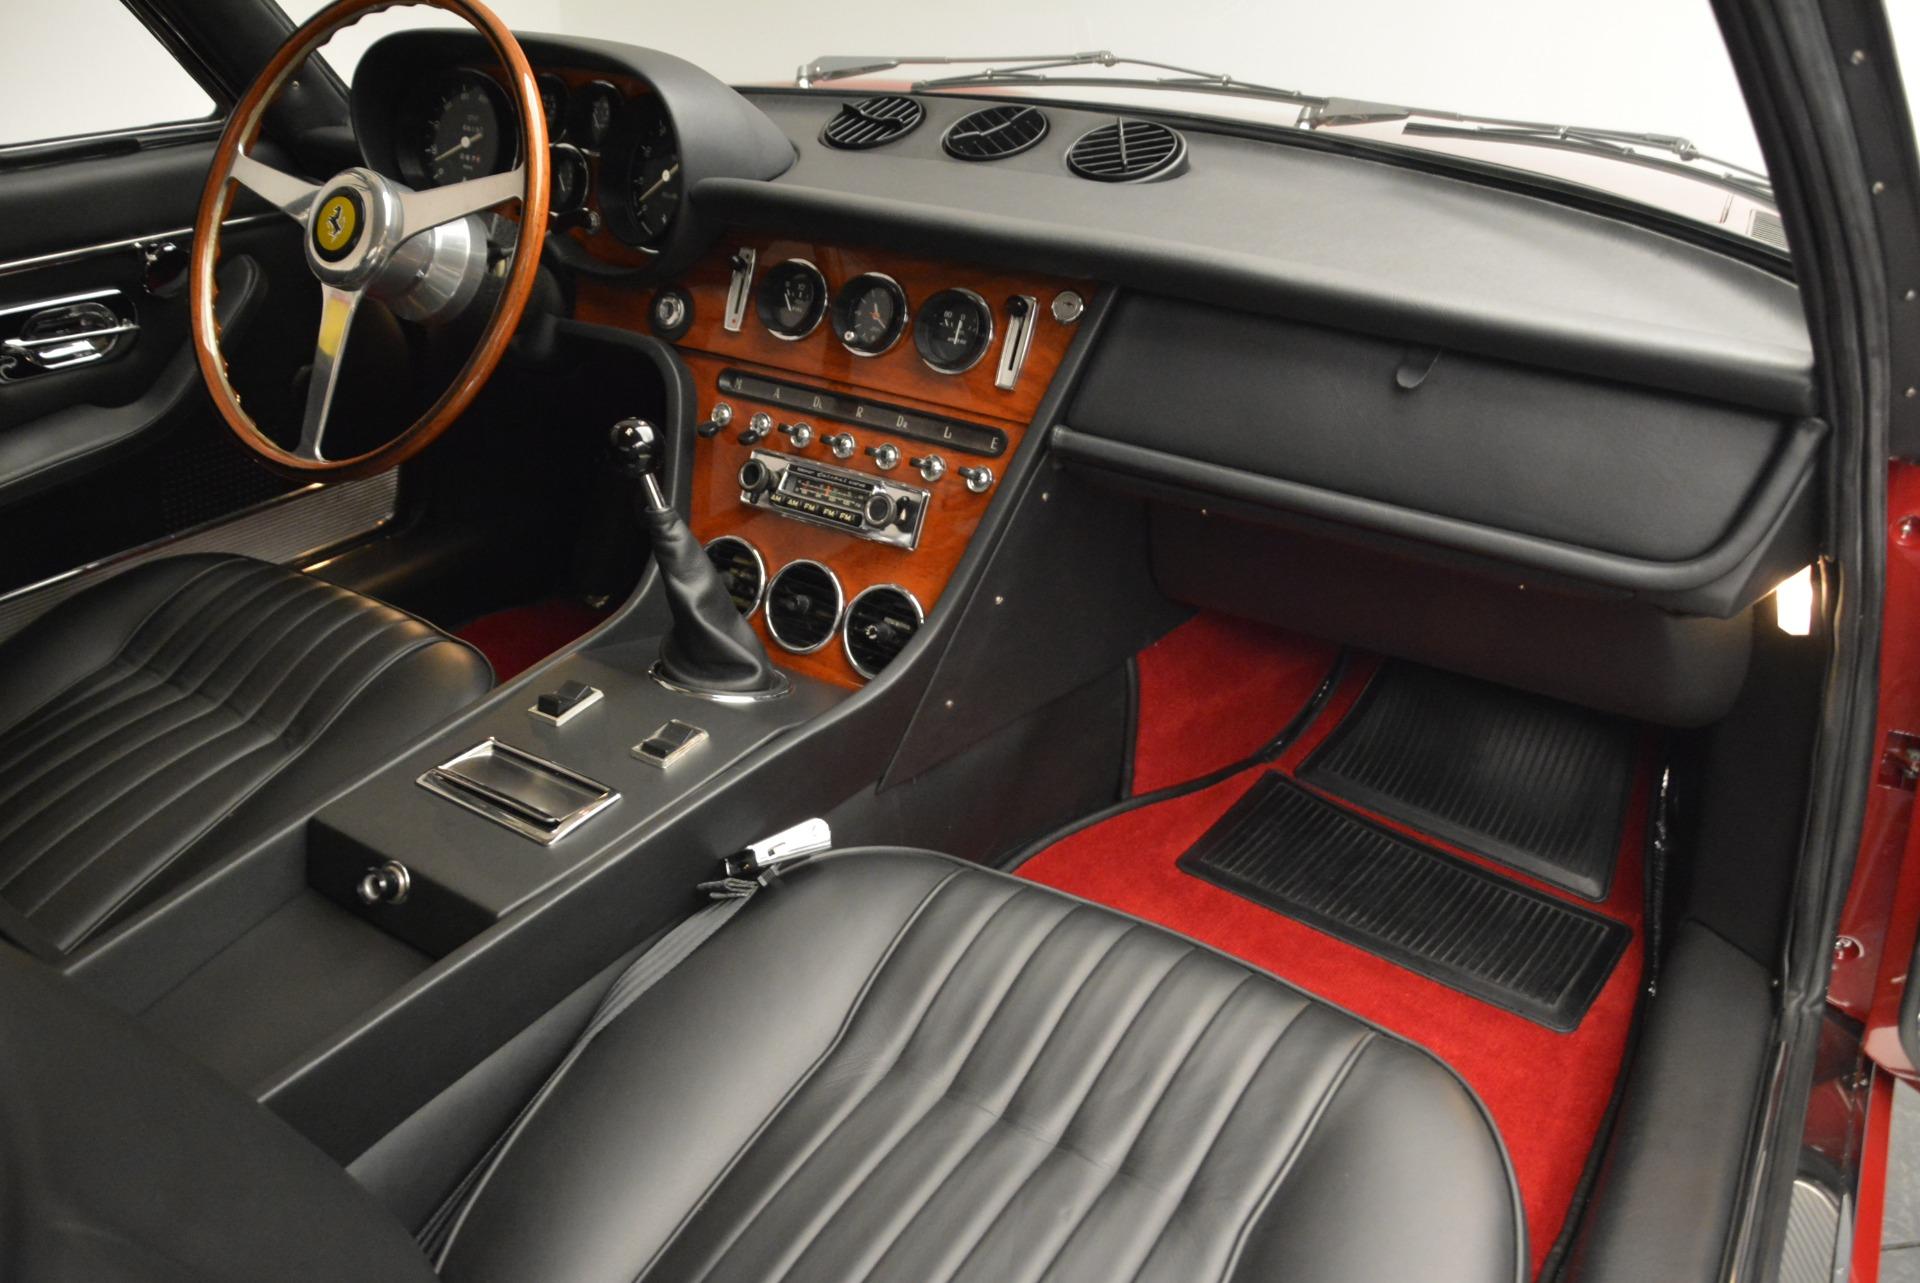 Used 1969 Ferrari 365 GT 2+2  For Sale In Greenwich, CT 1995_p18